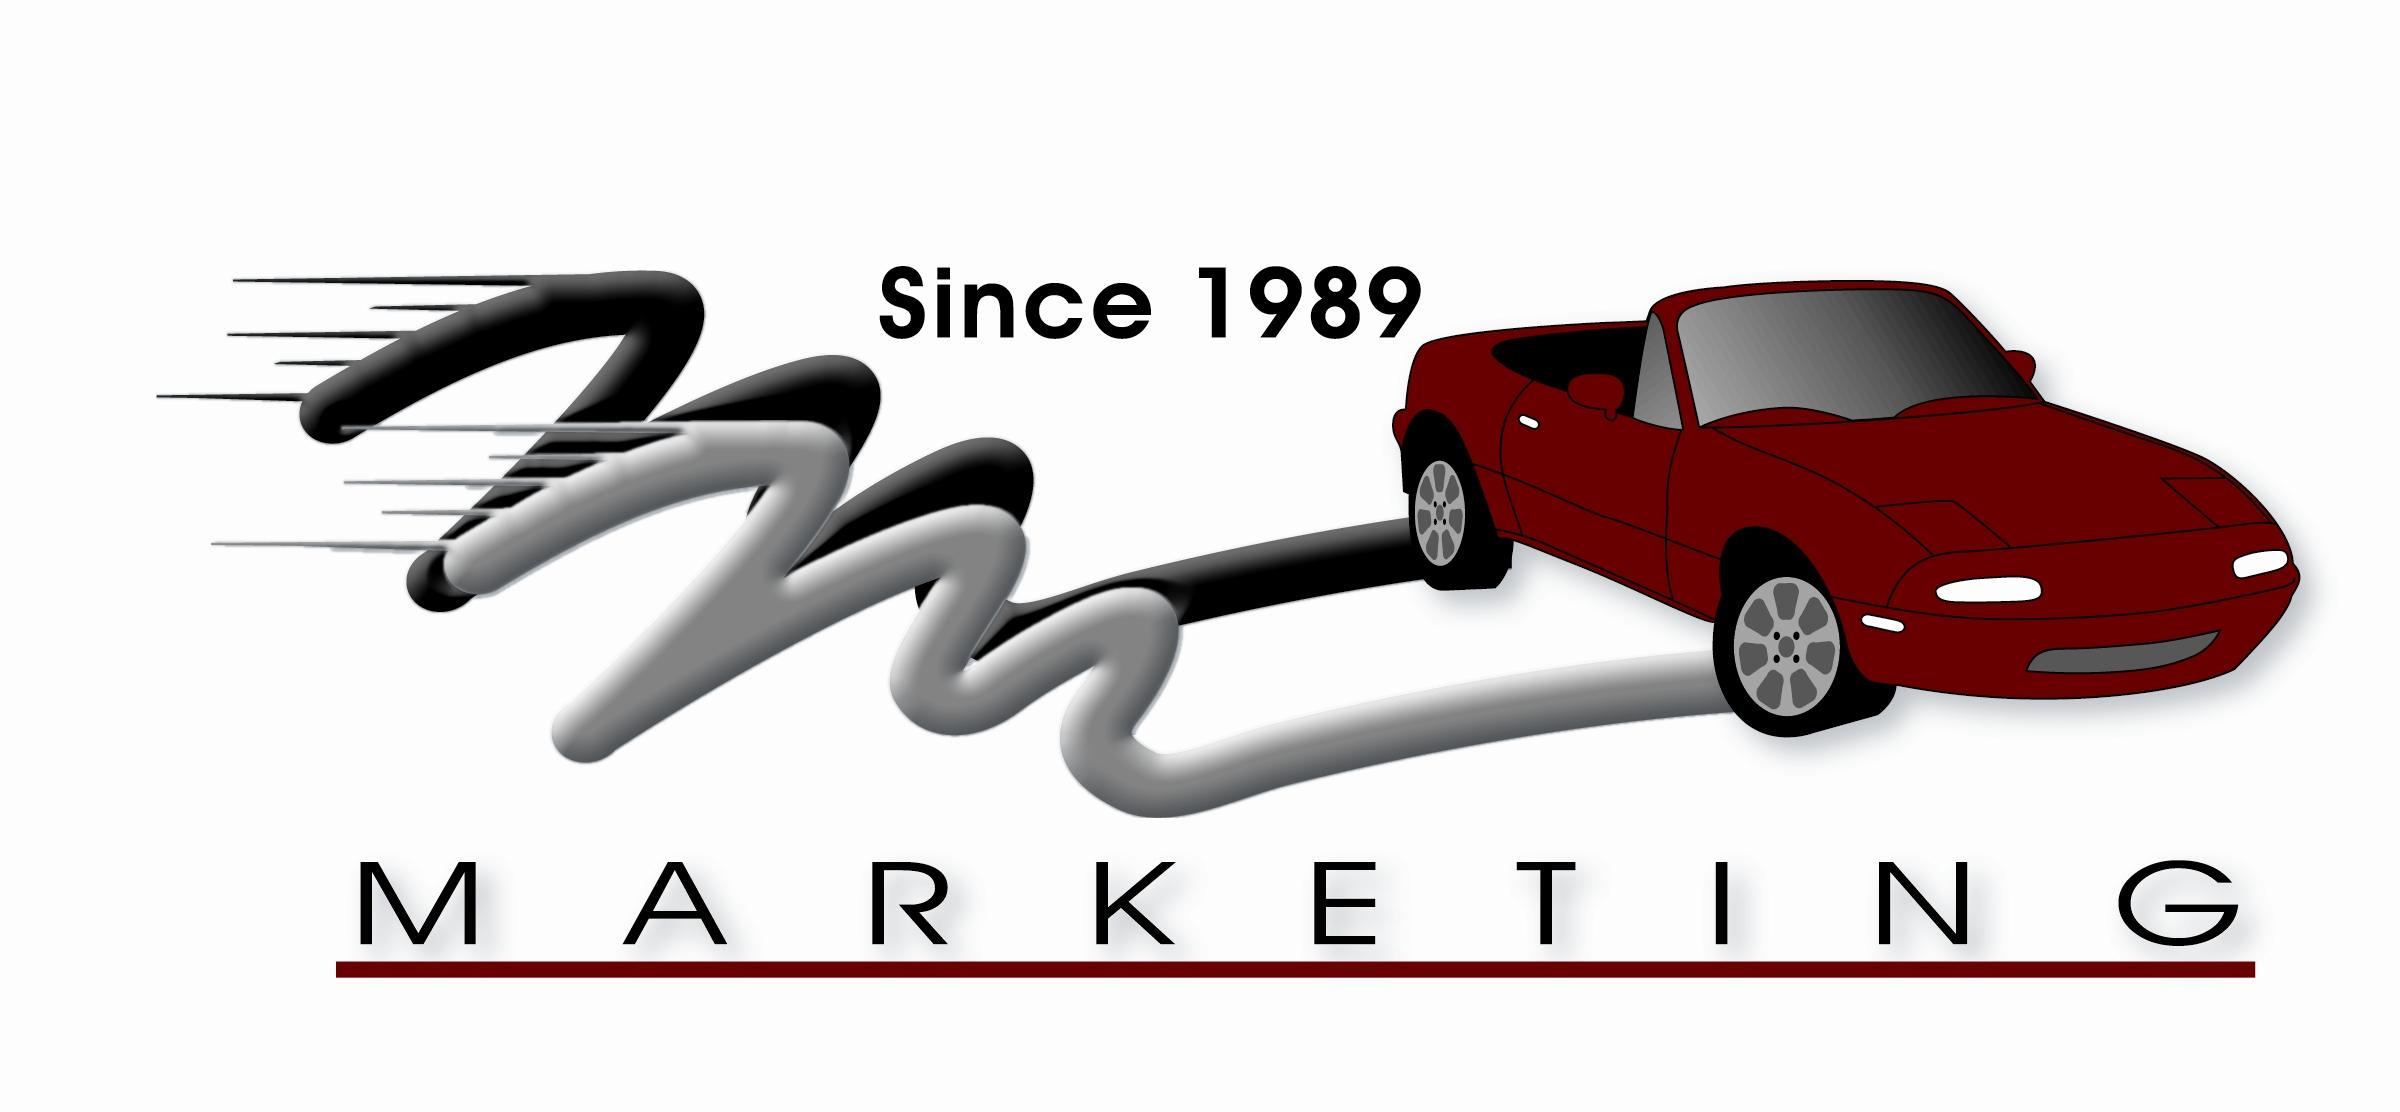 Discount Tire Hours Sunday >> Willamette Valley Miata Club